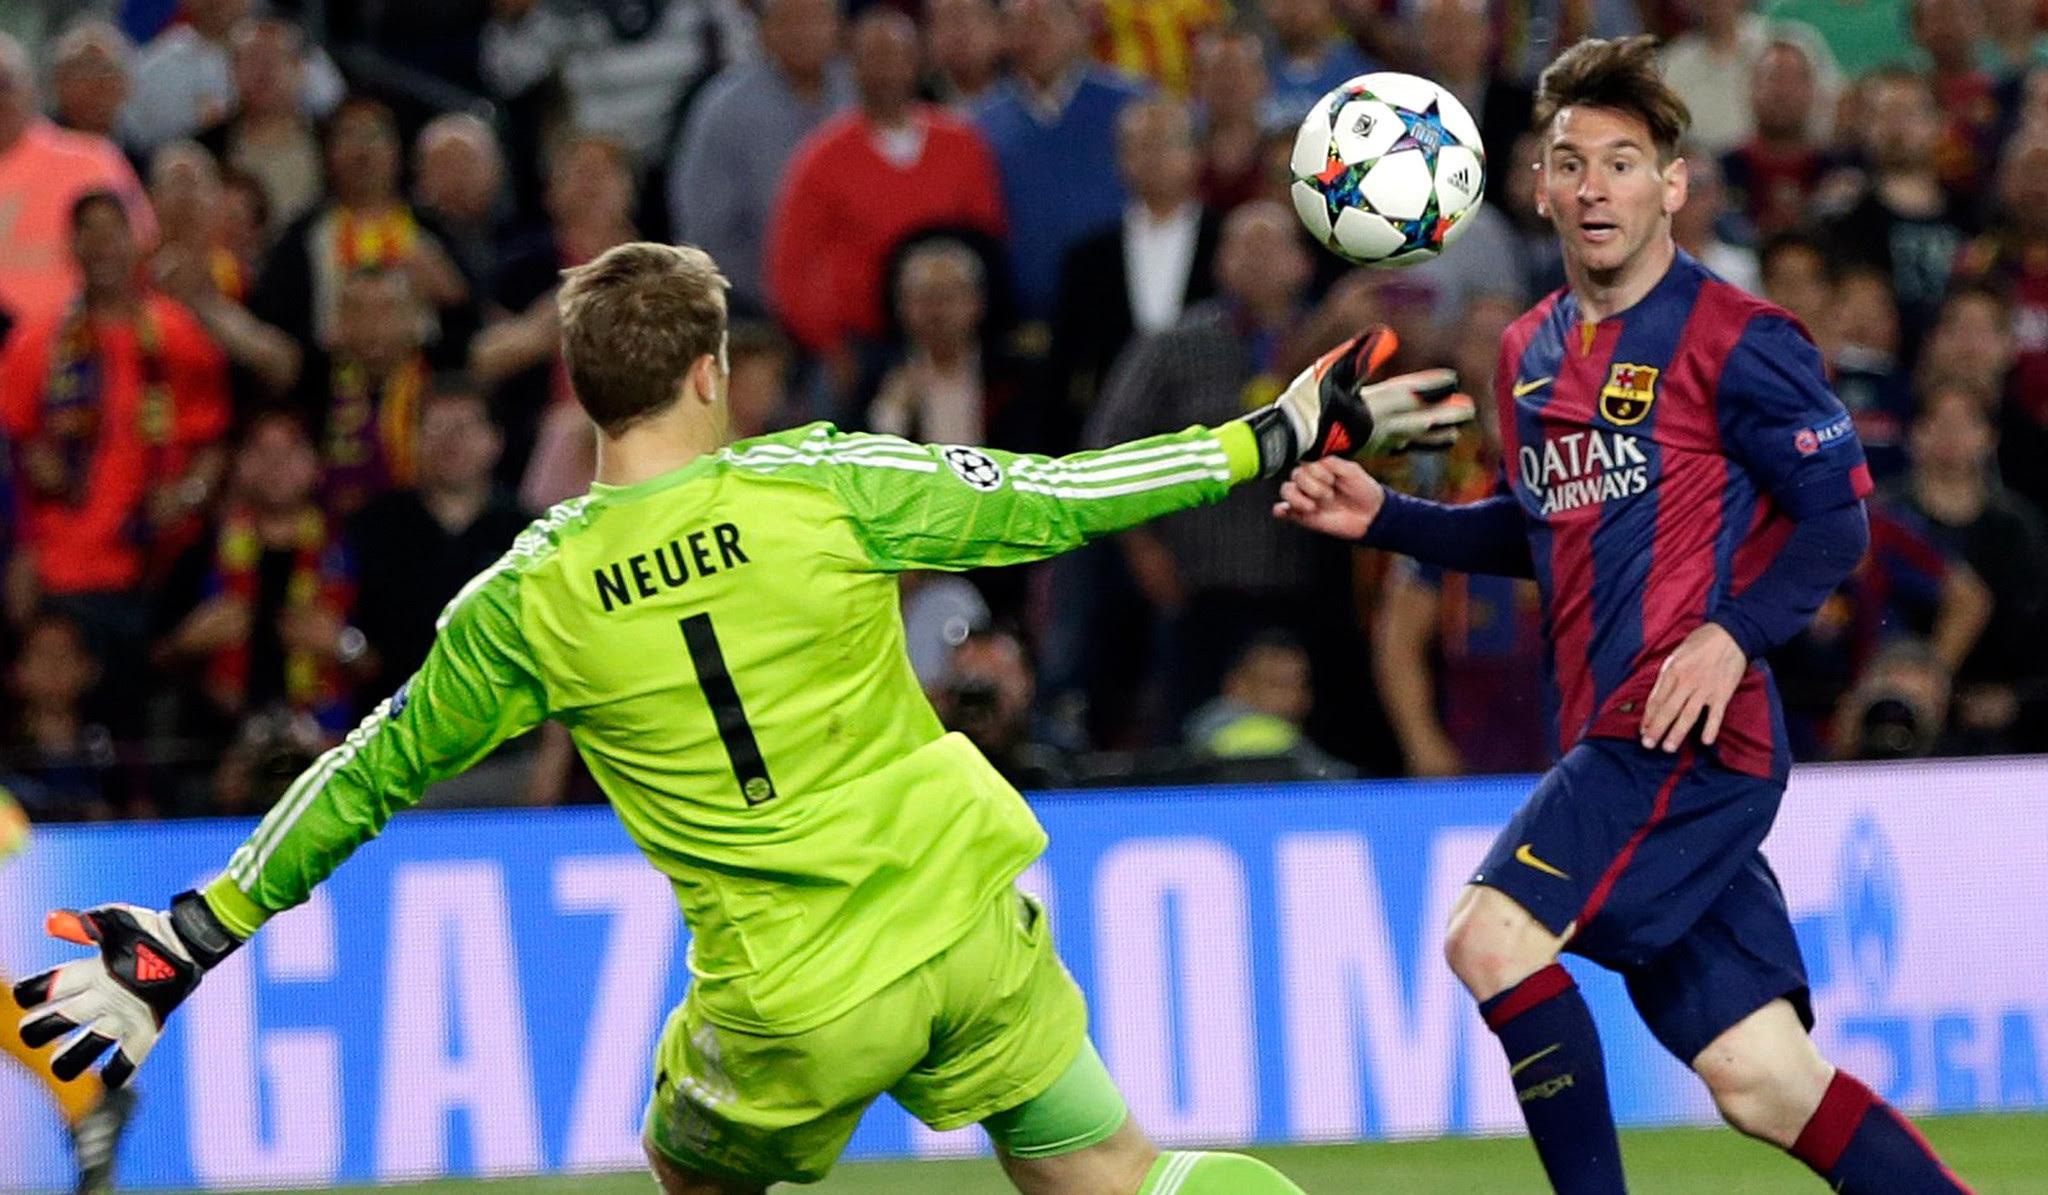 Watch Lionel Messi score two amazing goals vs. Bayern ...